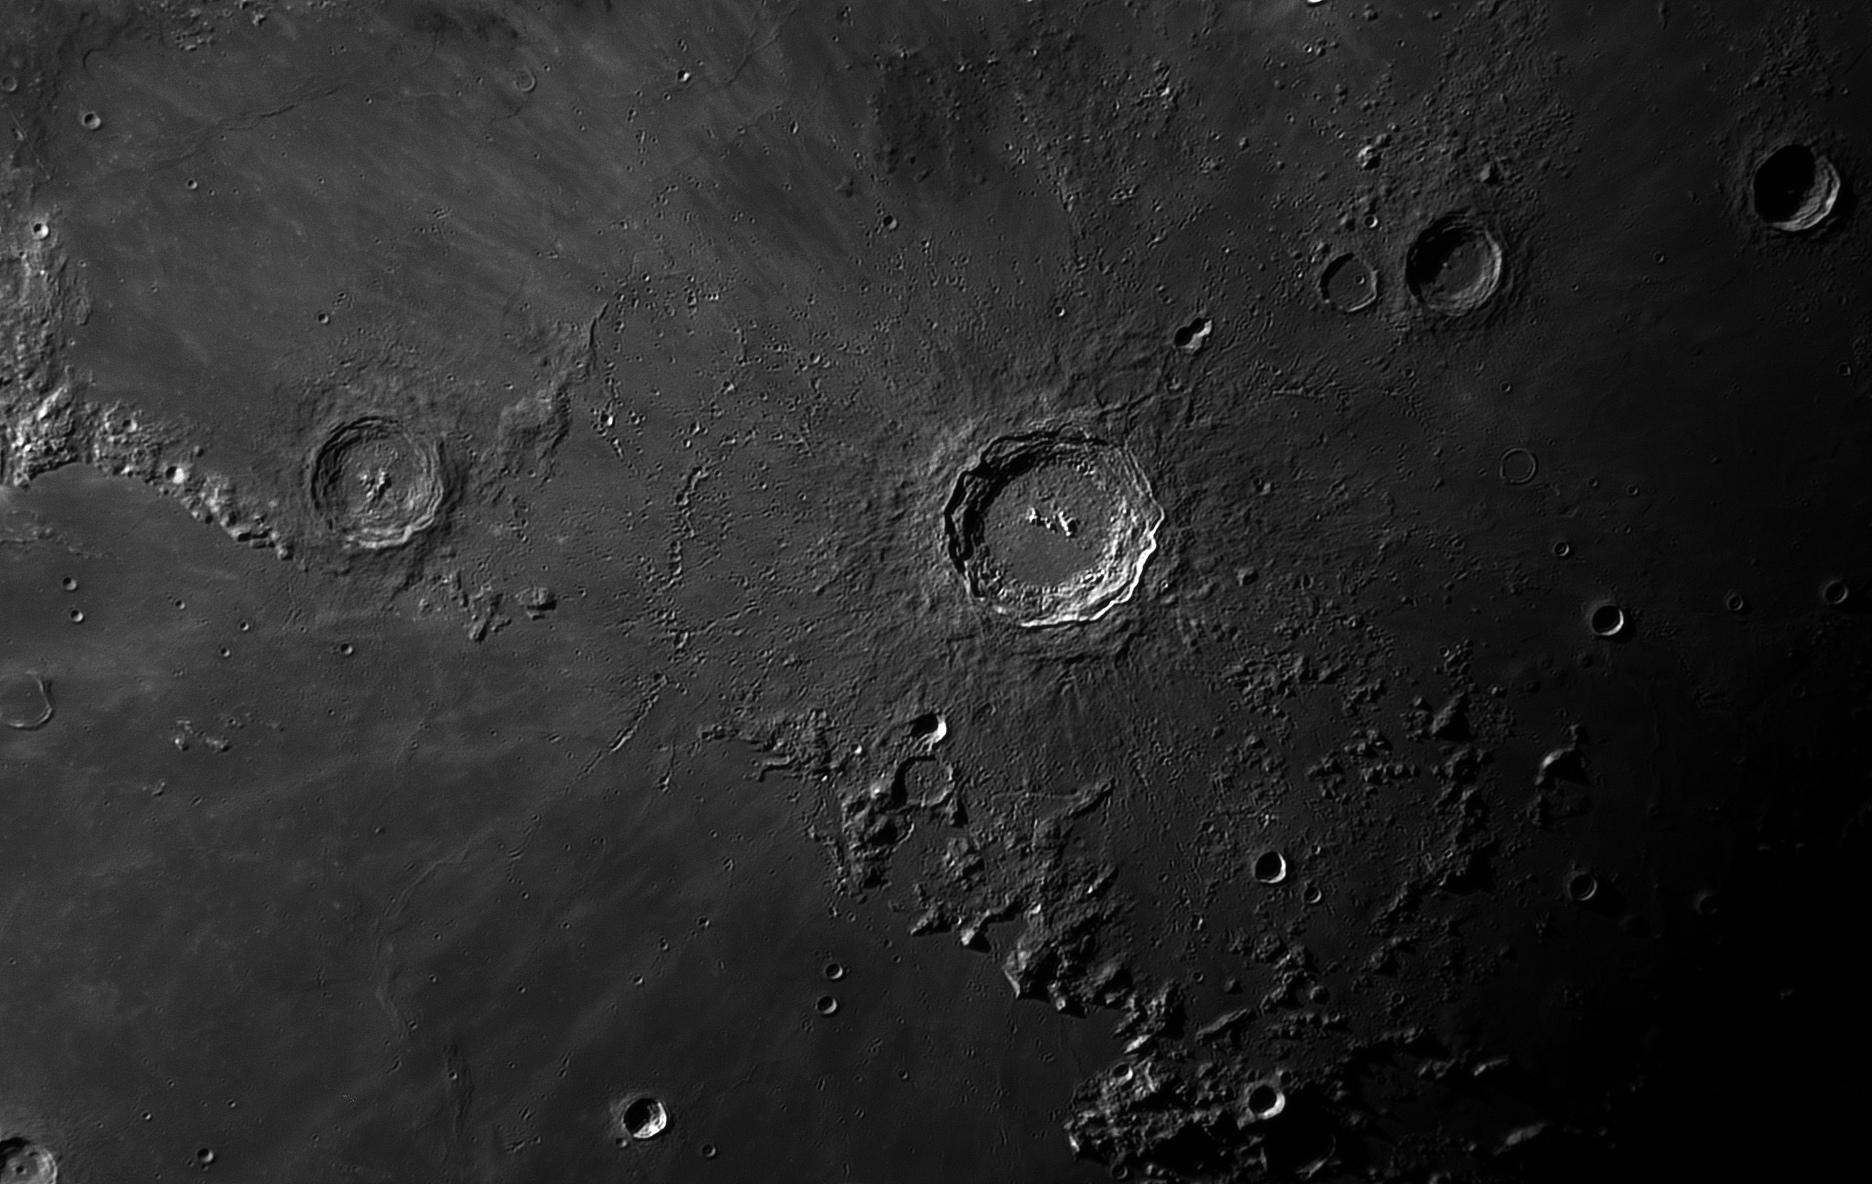 Moon_30_Sep_2017_20_27_38_HaT-F27_ZWO-ASI174MM_AS_F178_grad6_ap505_conv-ps.jpg